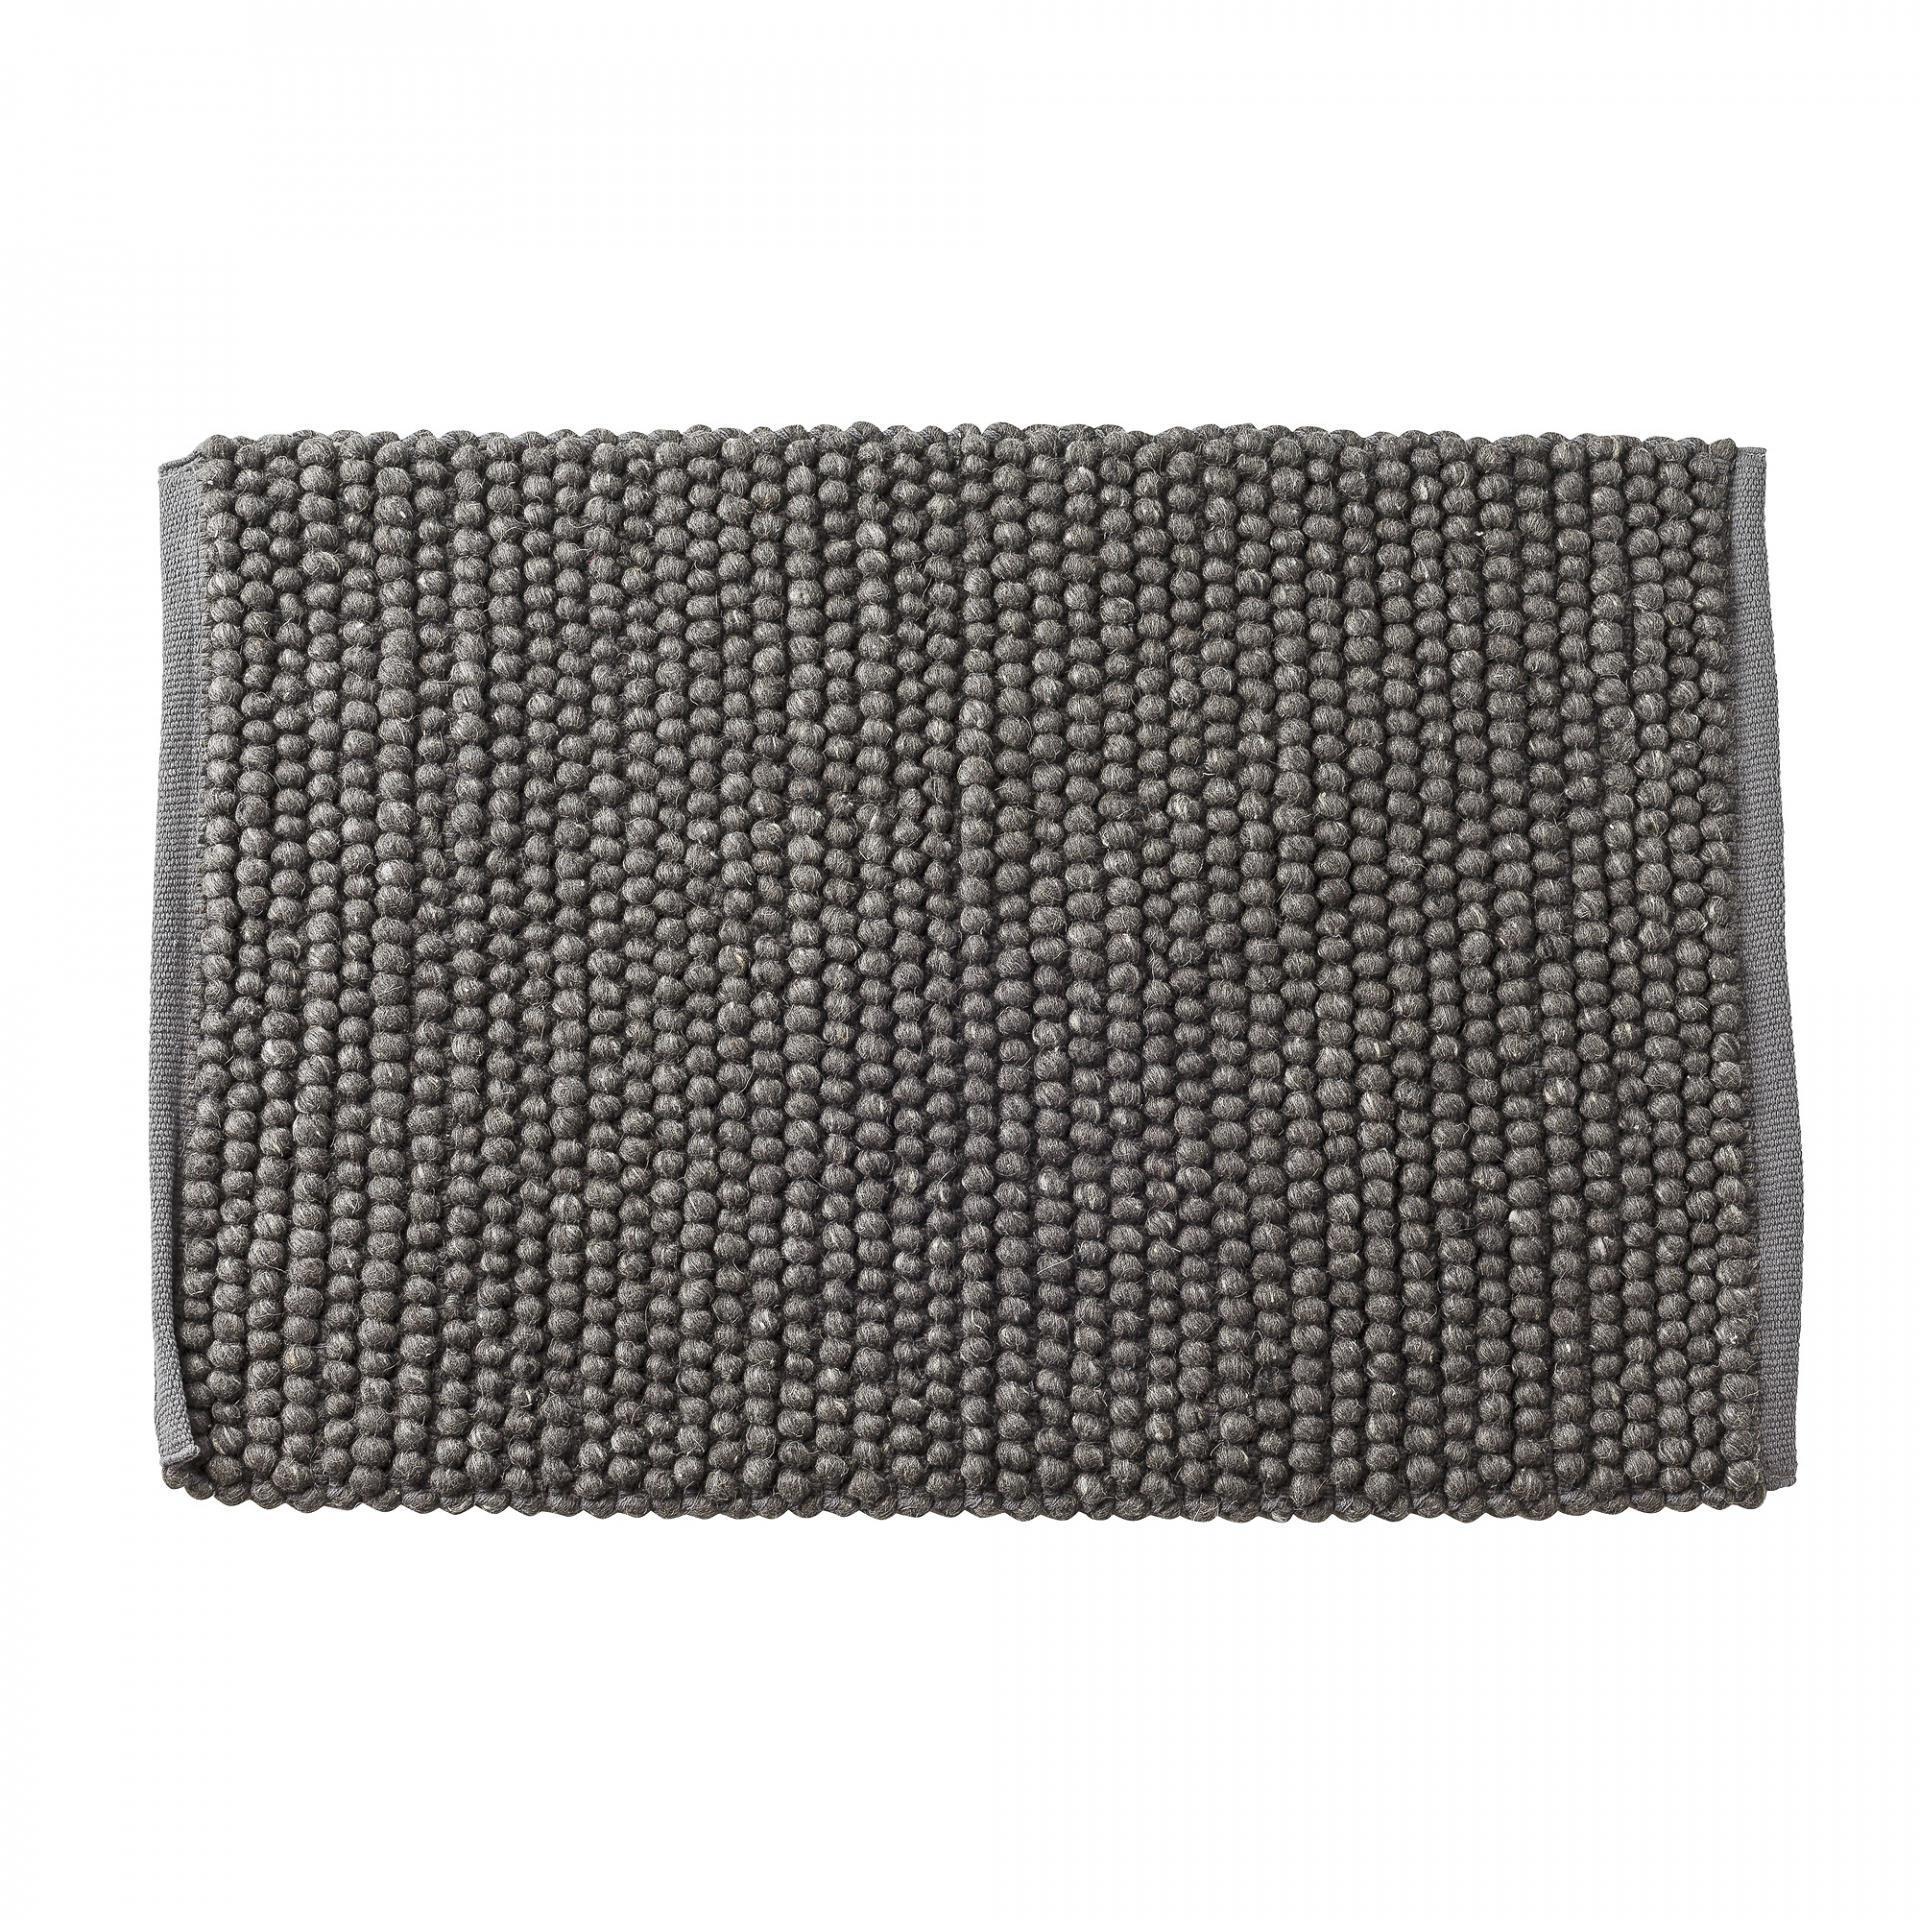 Bloomingville Vlněný koberečk Grey 60x90, šedá barva, textil